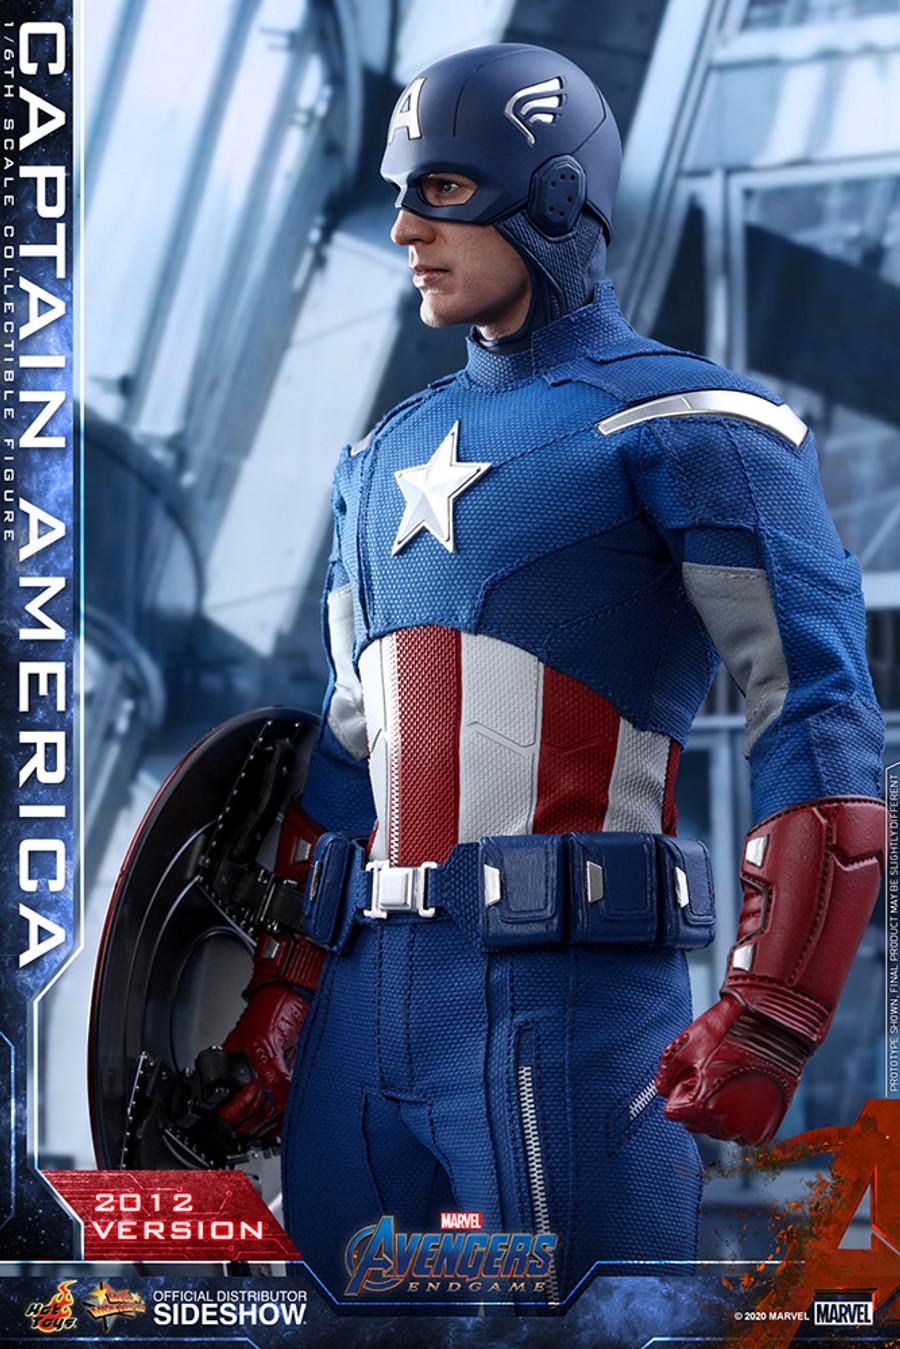 Hot Toys - Captain America 2012 Version